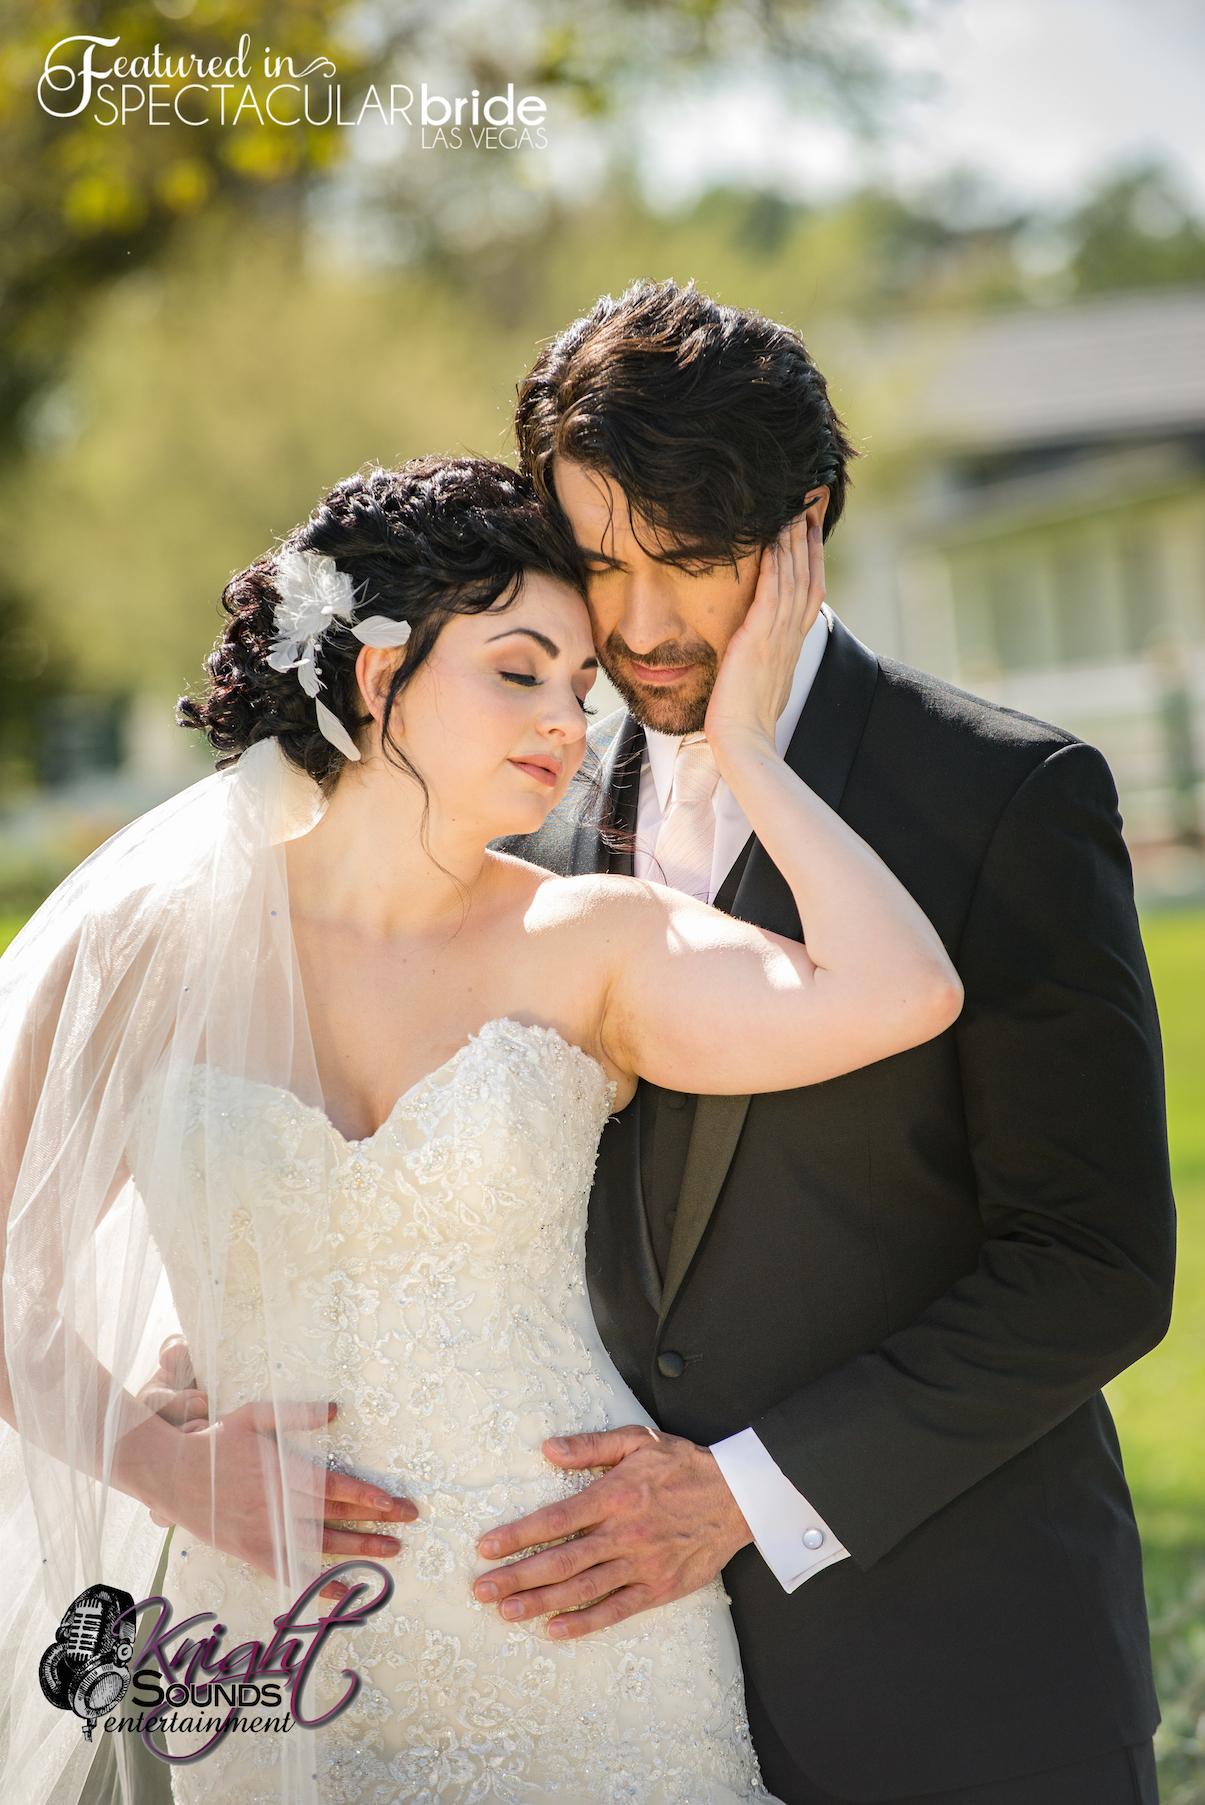 Spectacular Bride Magazine_KSElow-11